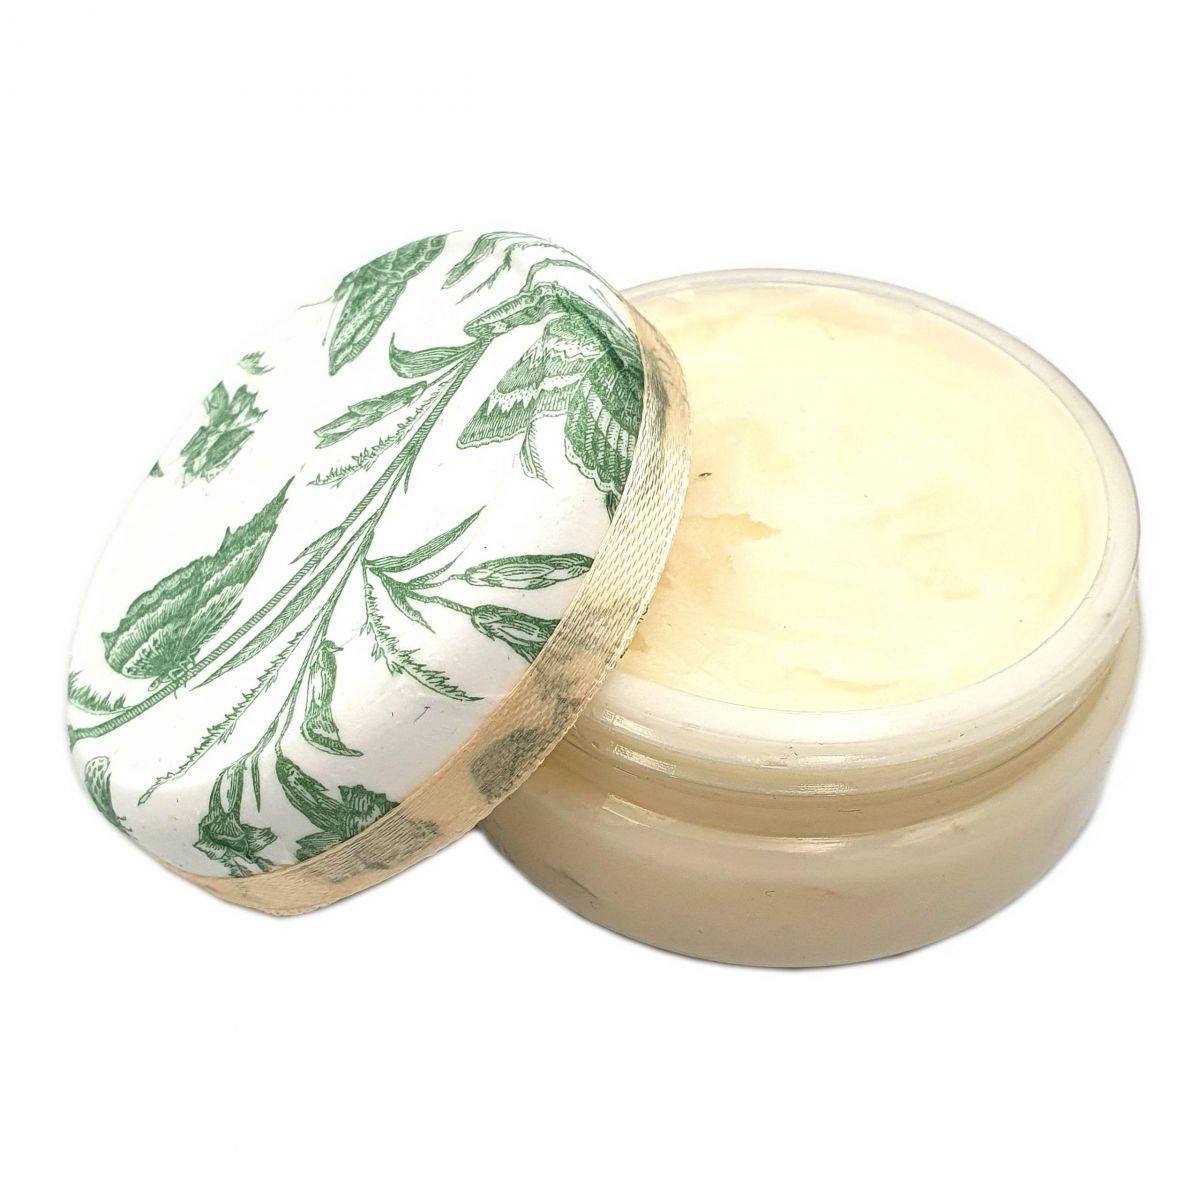 Balsam z masłem Shea Erotic - 100g - Lavea